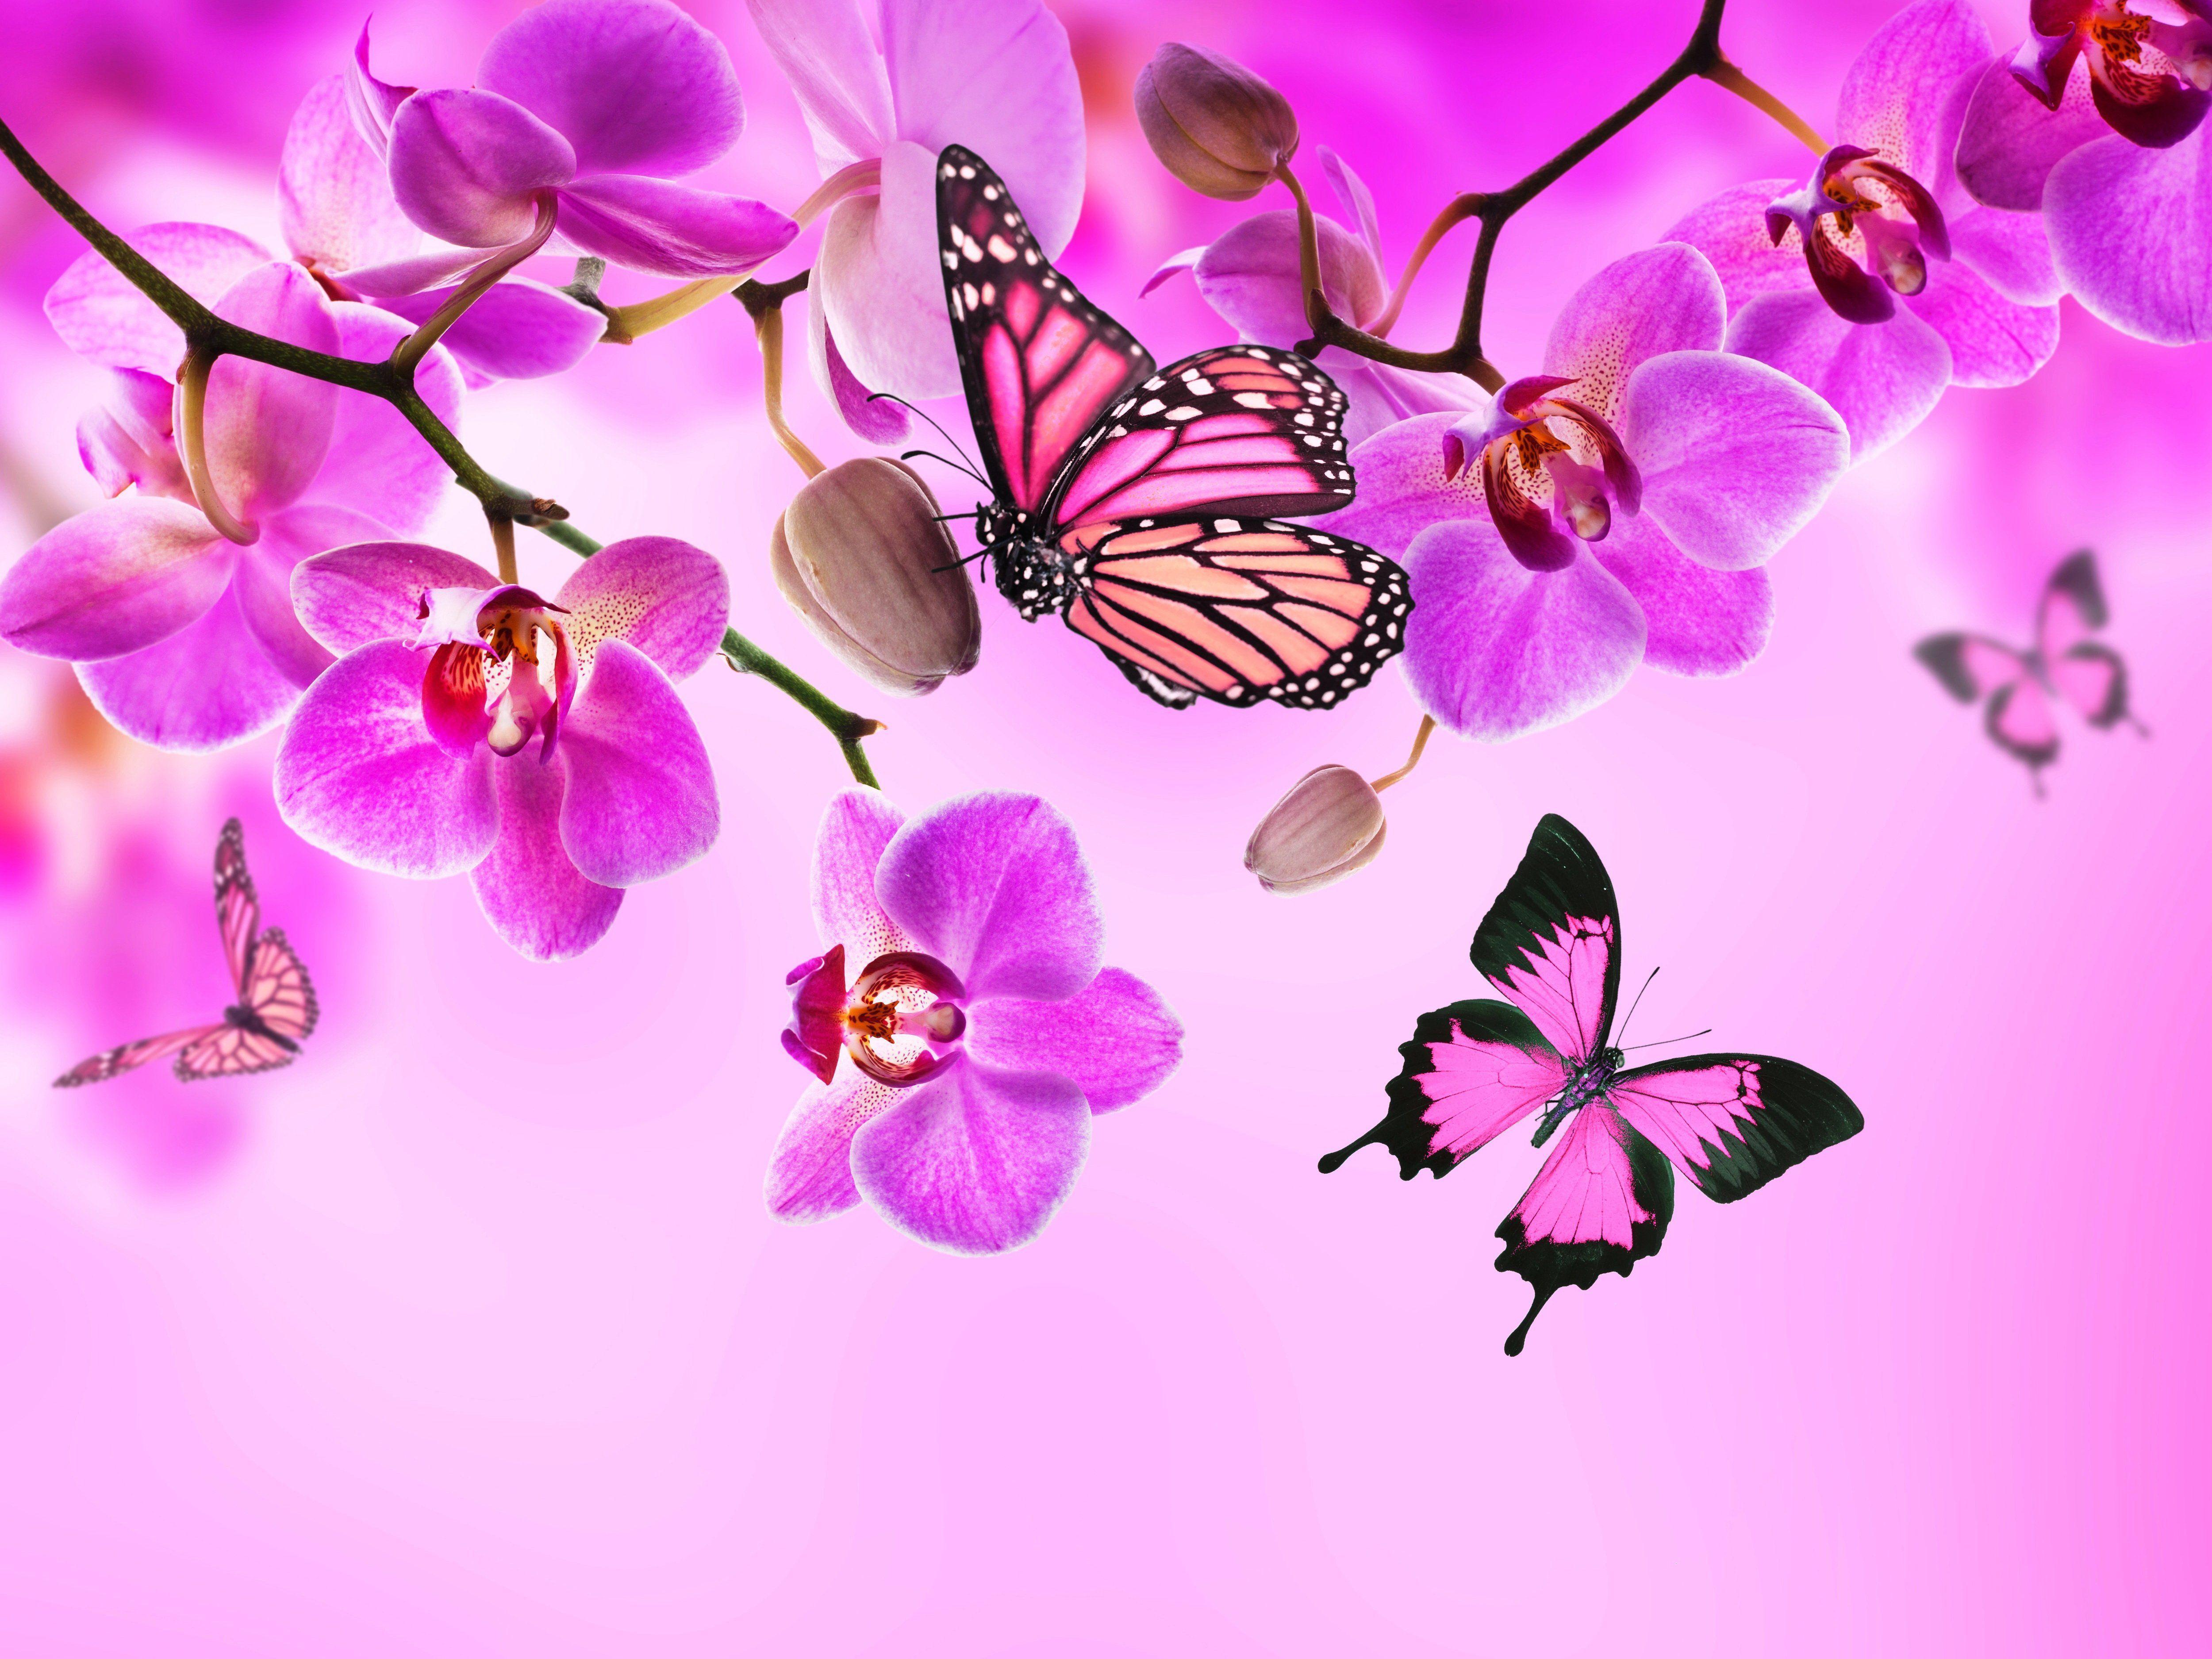 Pink Butterfly Desktop Wallpapers Top Free Pink Butterfly Desktop Backgrounds Wallpaperaccess wallpaperaccess